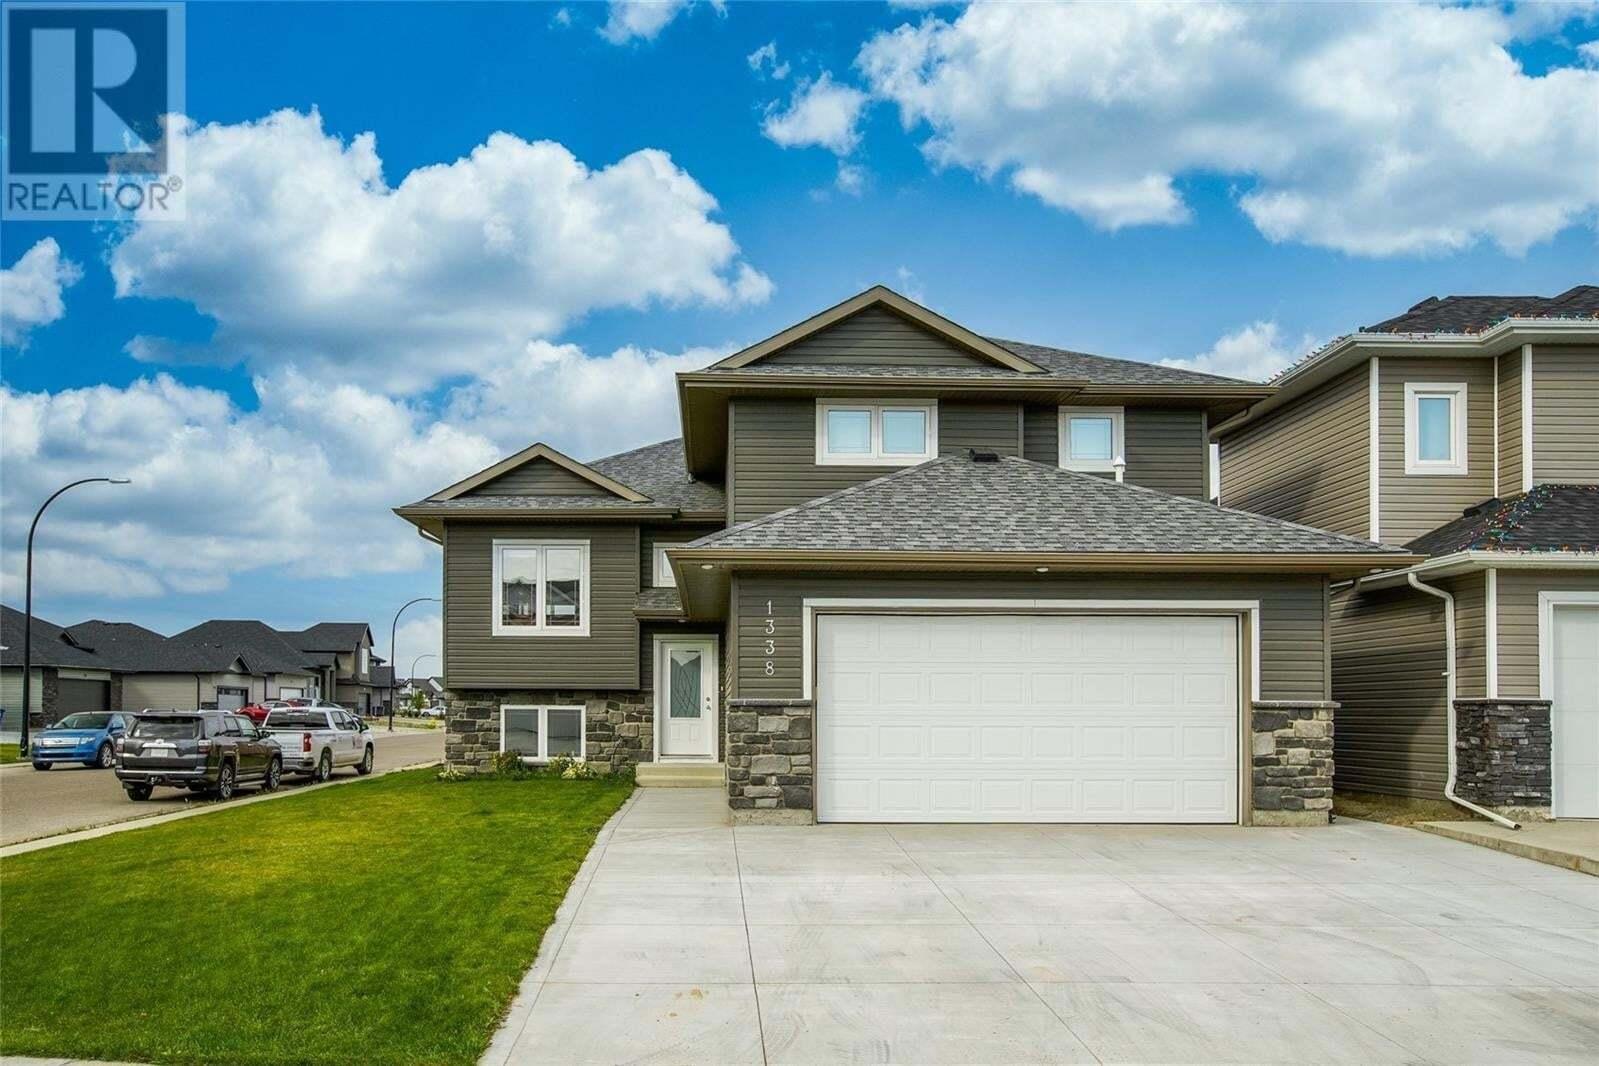 House for sale at 1338 Hargreaves Wy Saskatoon Saskatchewan - MLS: SK827836